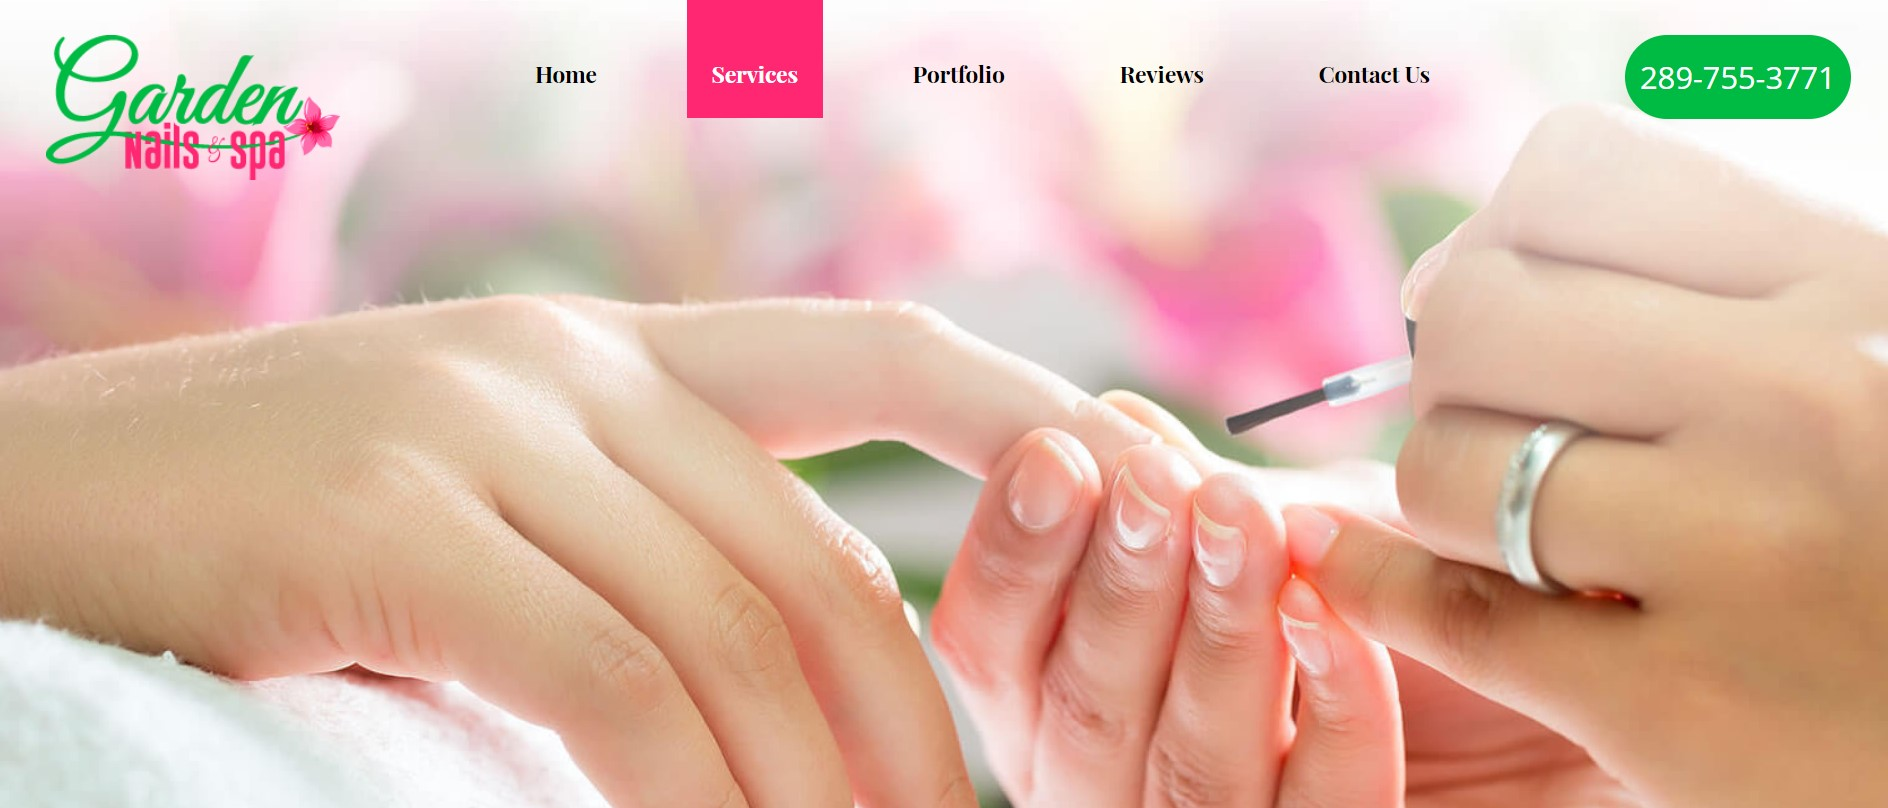 garden nails spa nail salon in hamilton